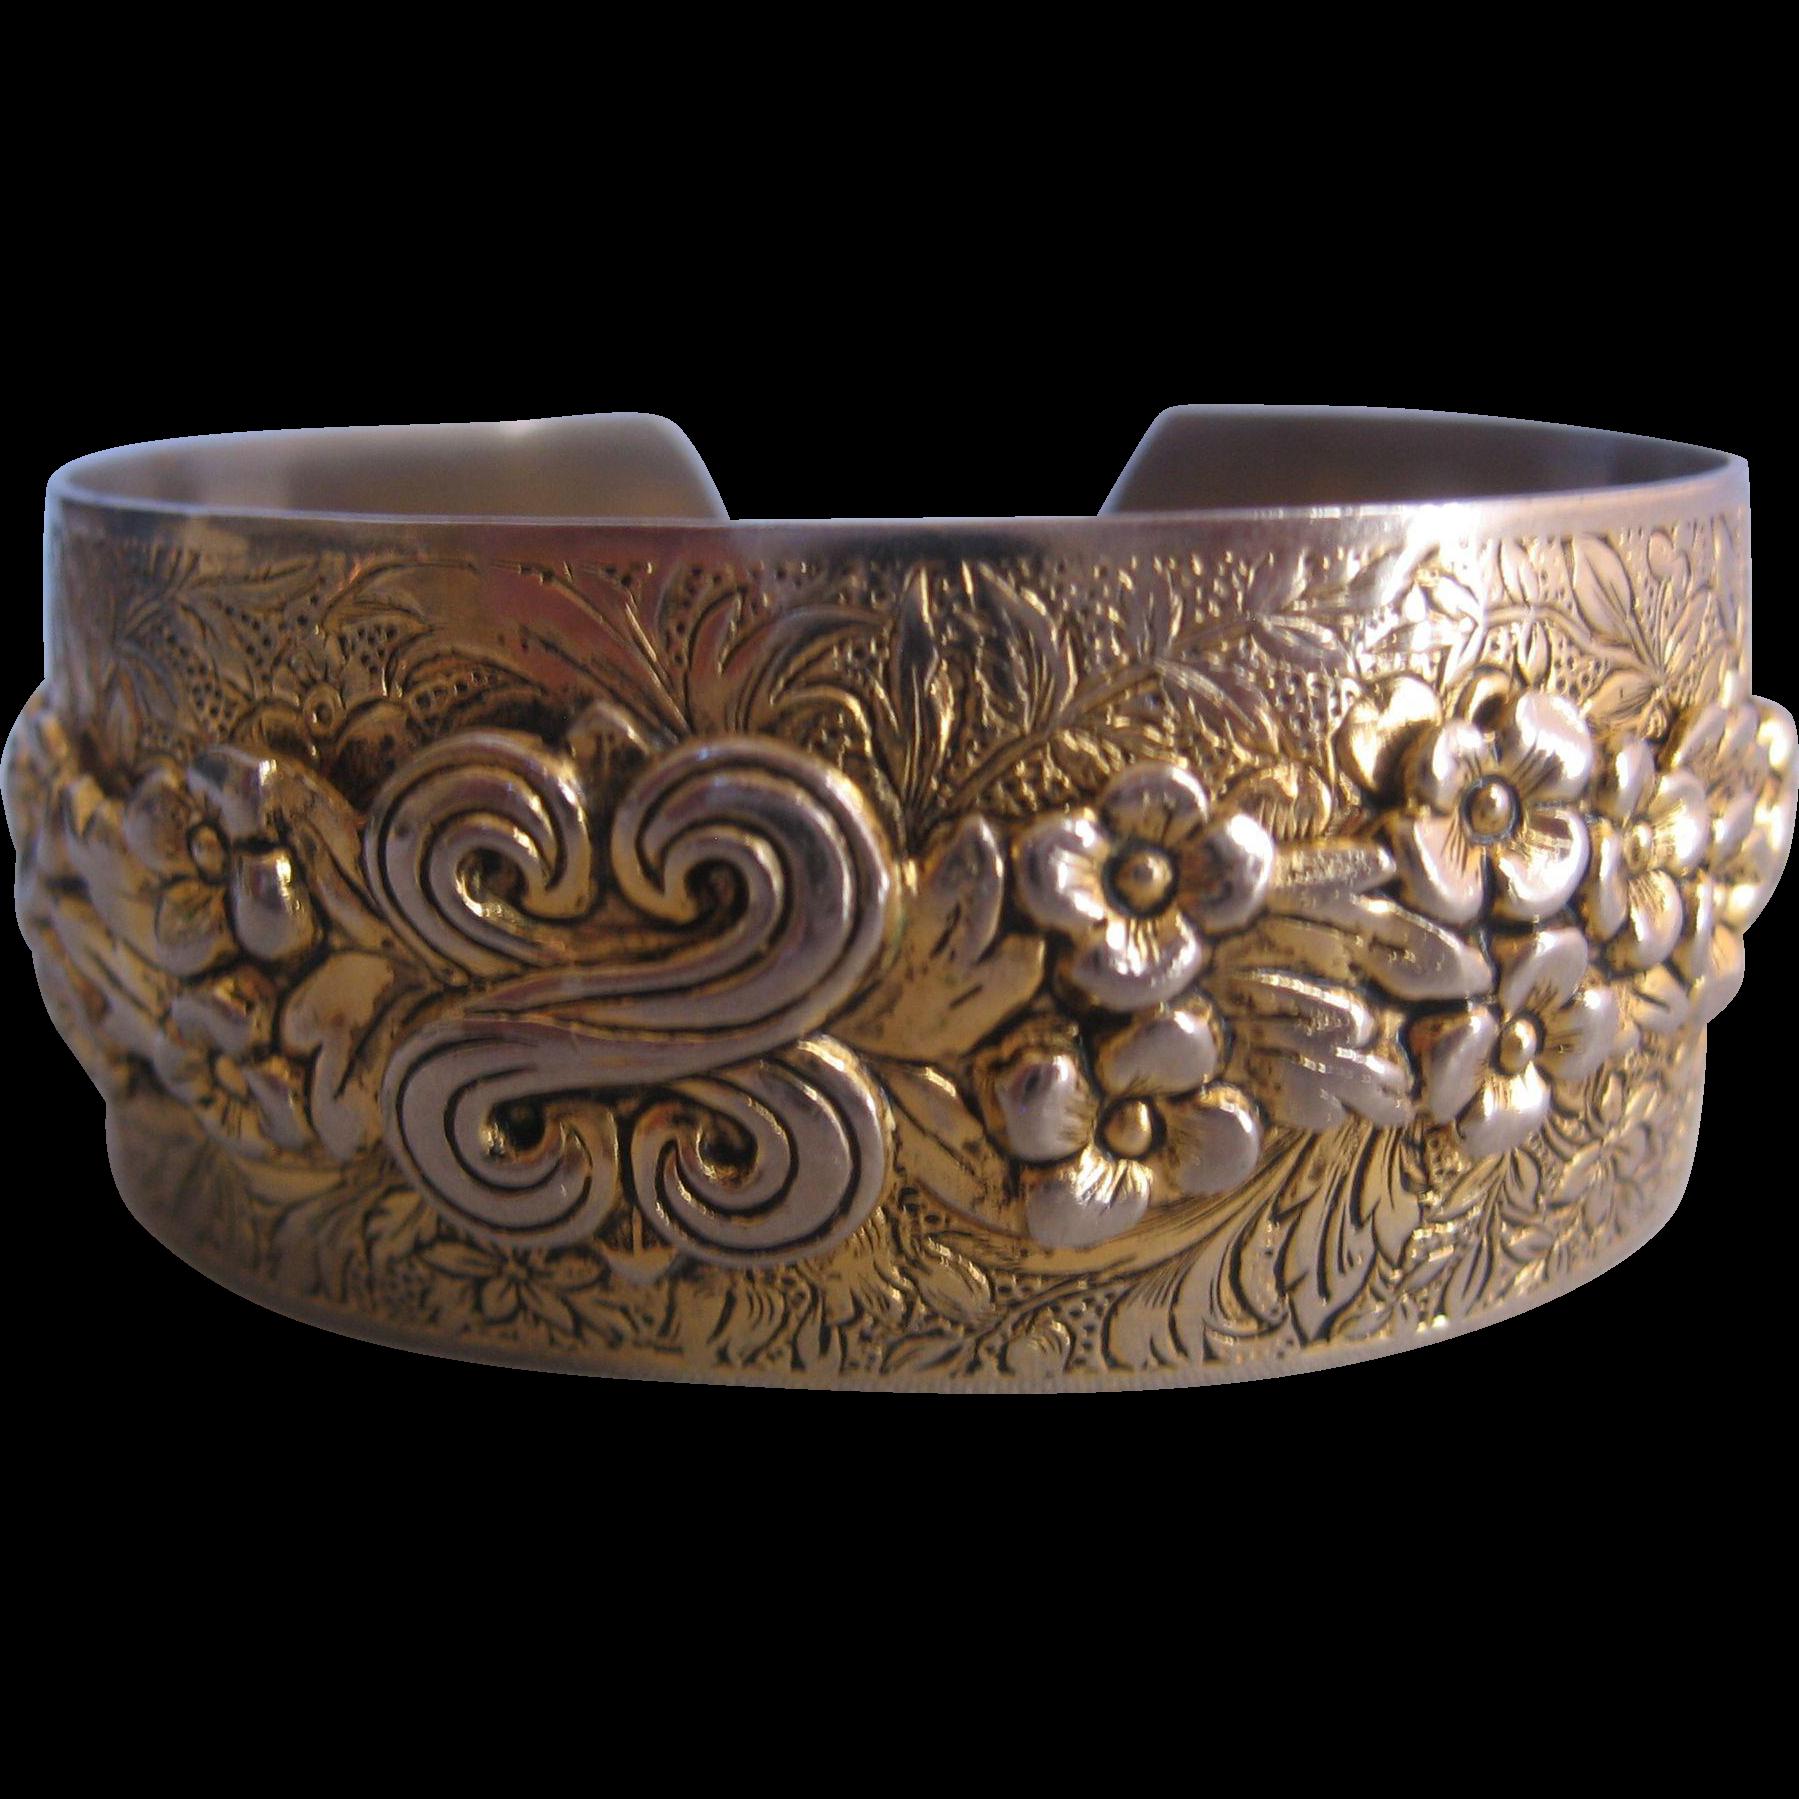 Vintage Brass Floral Cuff Bracelet From